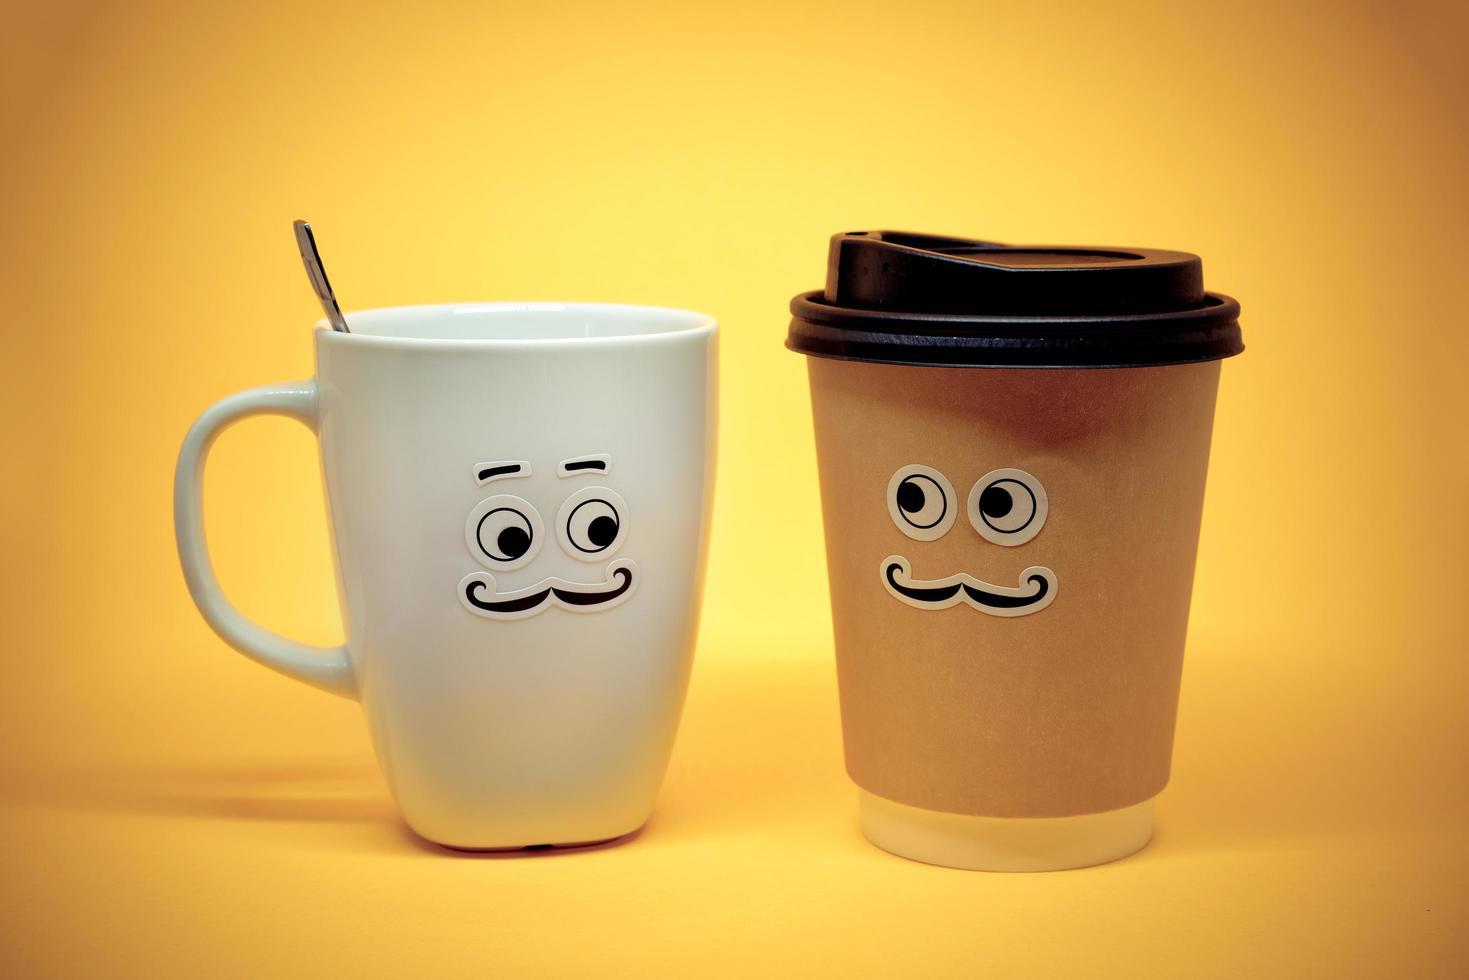 smiley koffiekopjes op gele achtergrond foto